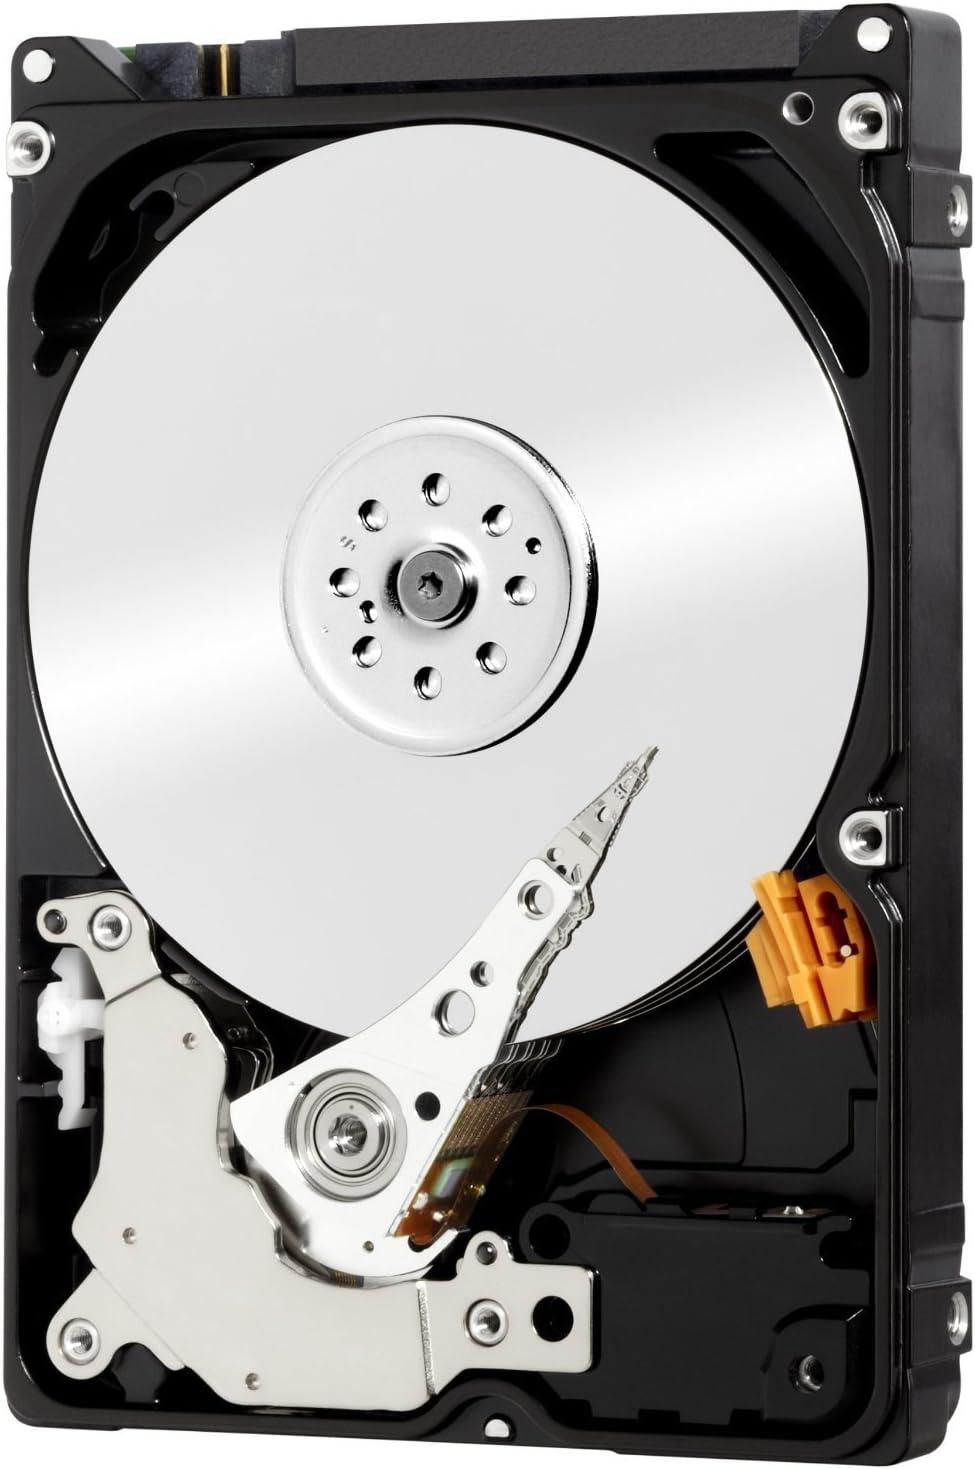 Seagate Exos 7E8 6TB 512e SATA 256MB Cache 3.5-Inch Enterprise Hard Drive (ST6000NM0115)